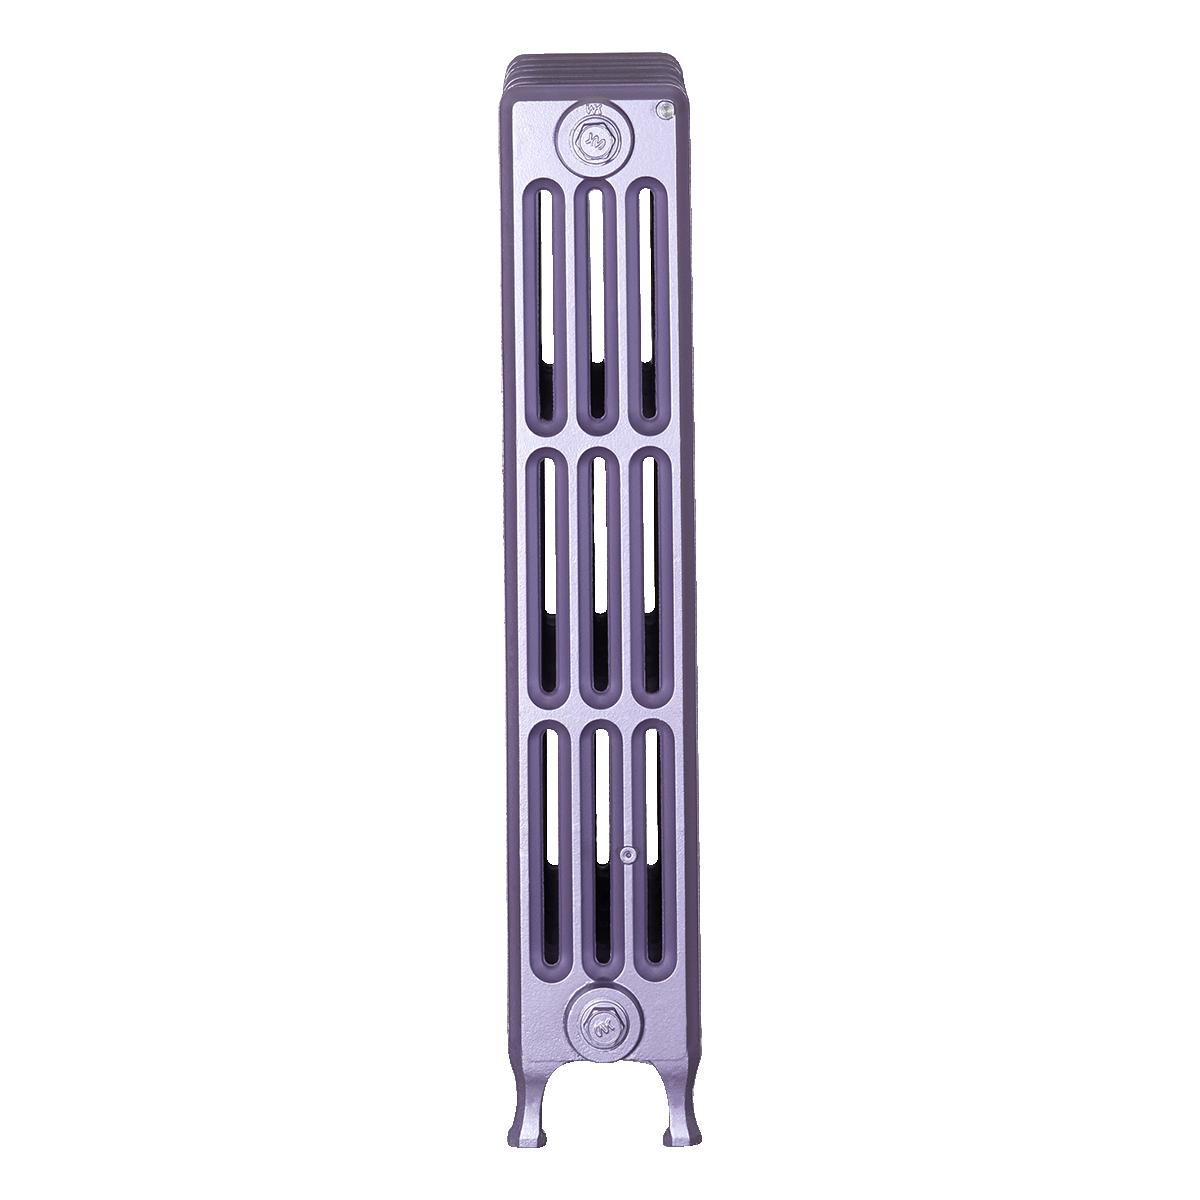 Ironworks Radiators Inc. refurbished cast iron radiator Summerbridge in Lilac metallic